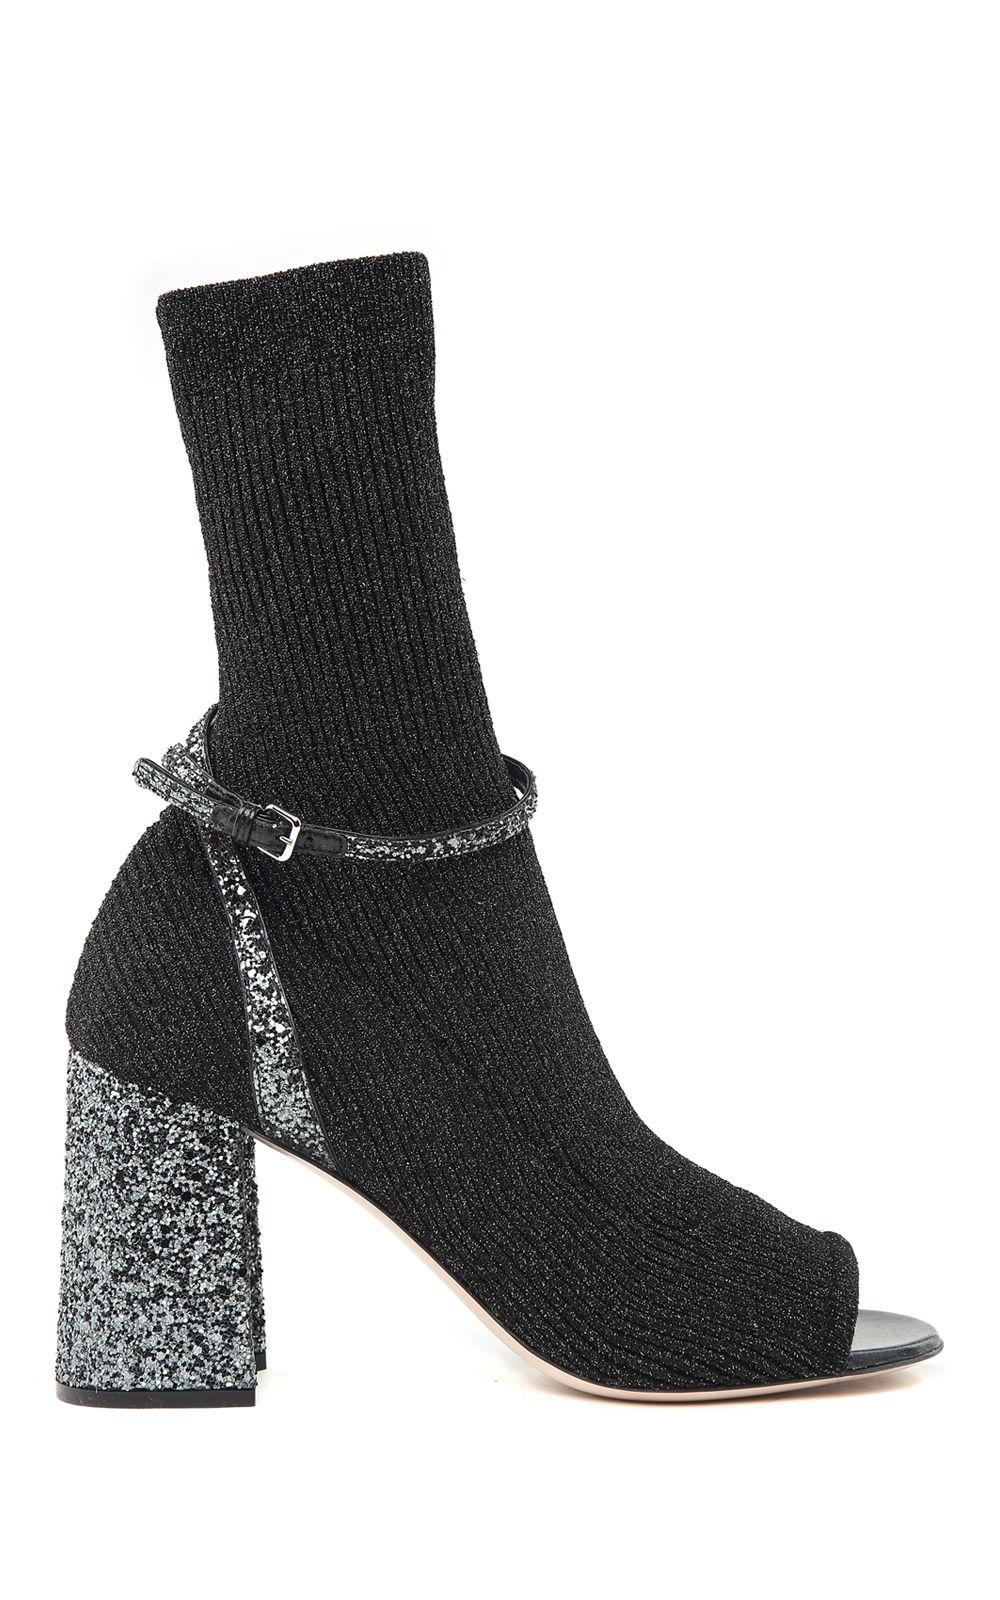 Miu Miu Lurex And Glitter-covered Sock Ankle Boots